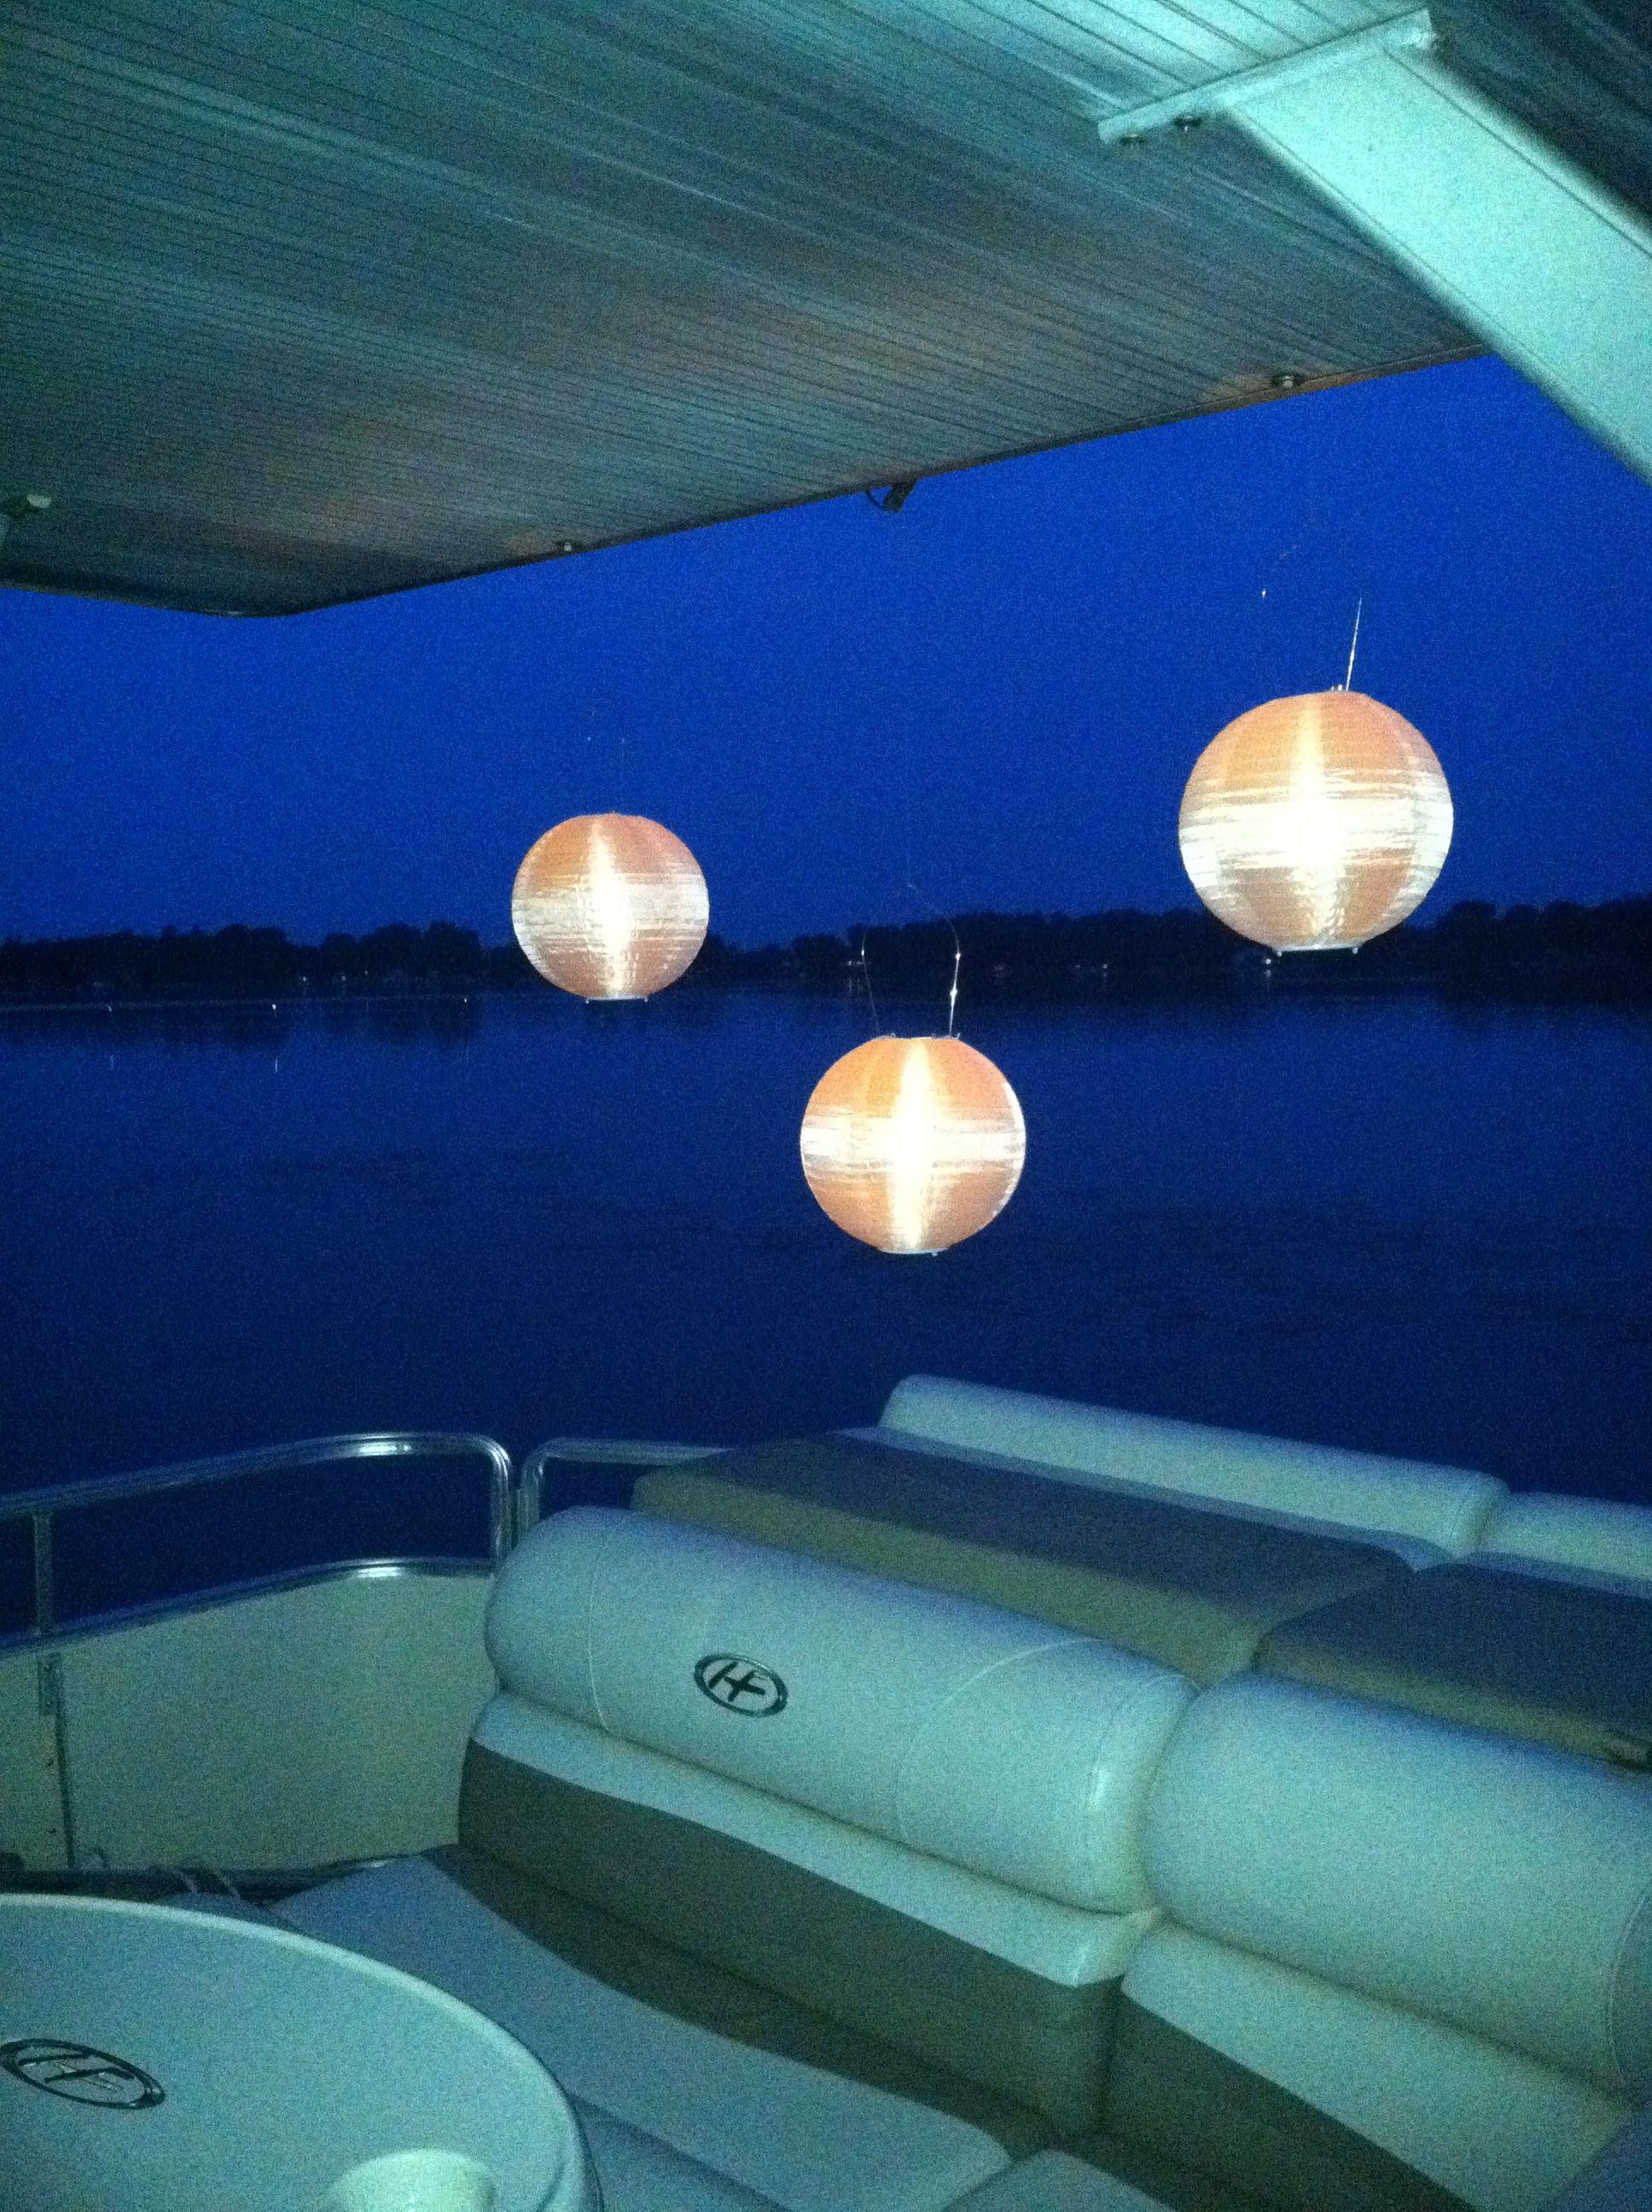 Solar Lights Pontoon Boat Accessories Pontoon Boat Party Lake Boat